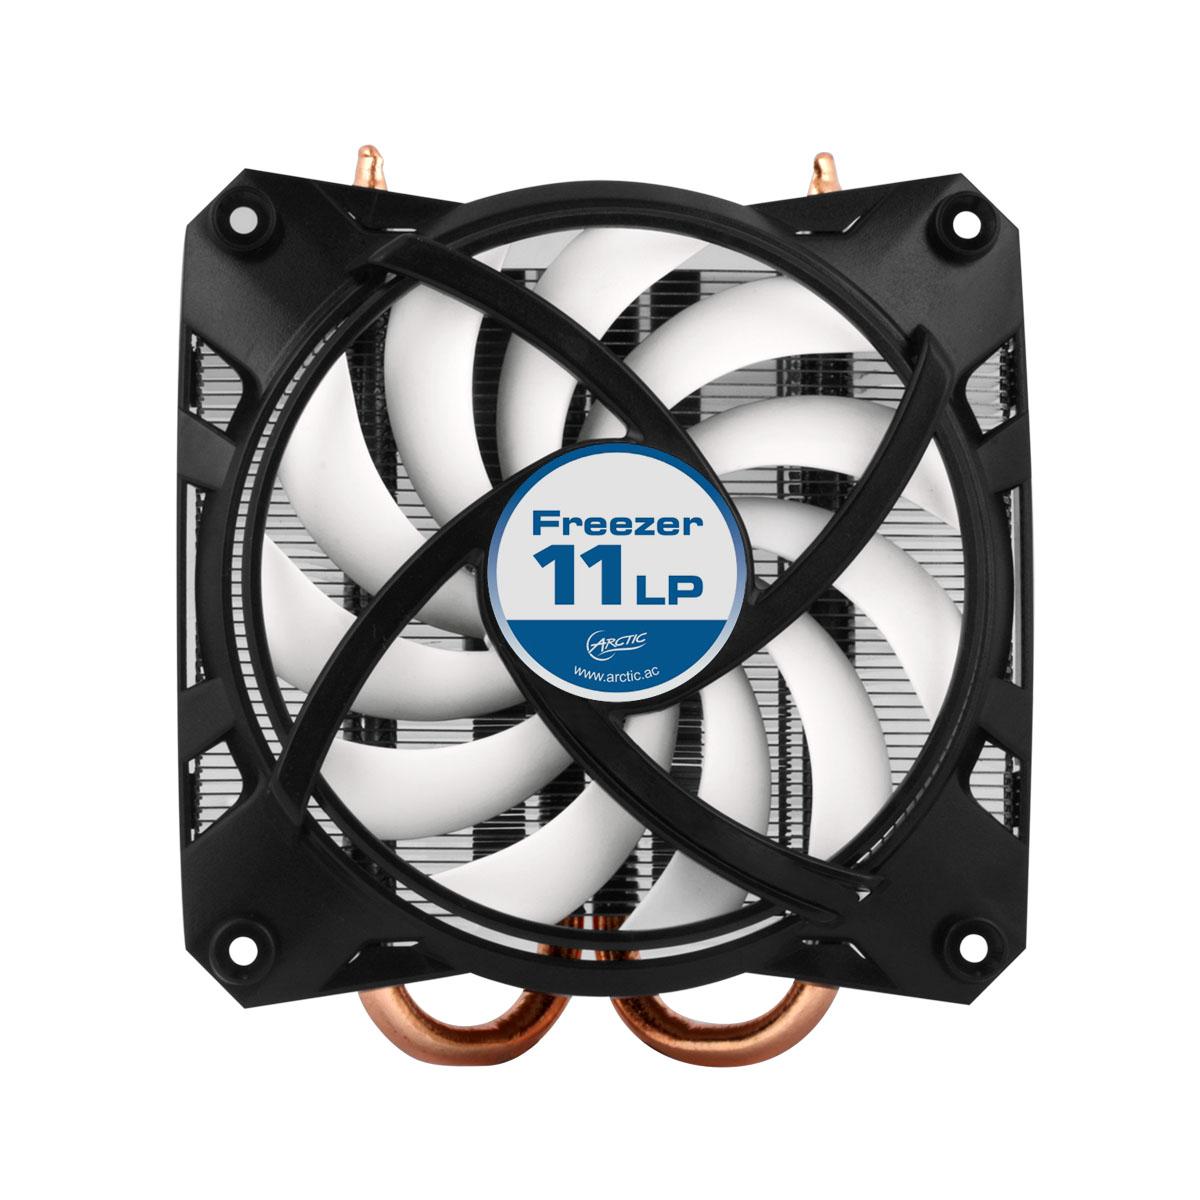 Fotografie Cooler Procesor Arctic Freezer 11 LP, Compatibil Intel